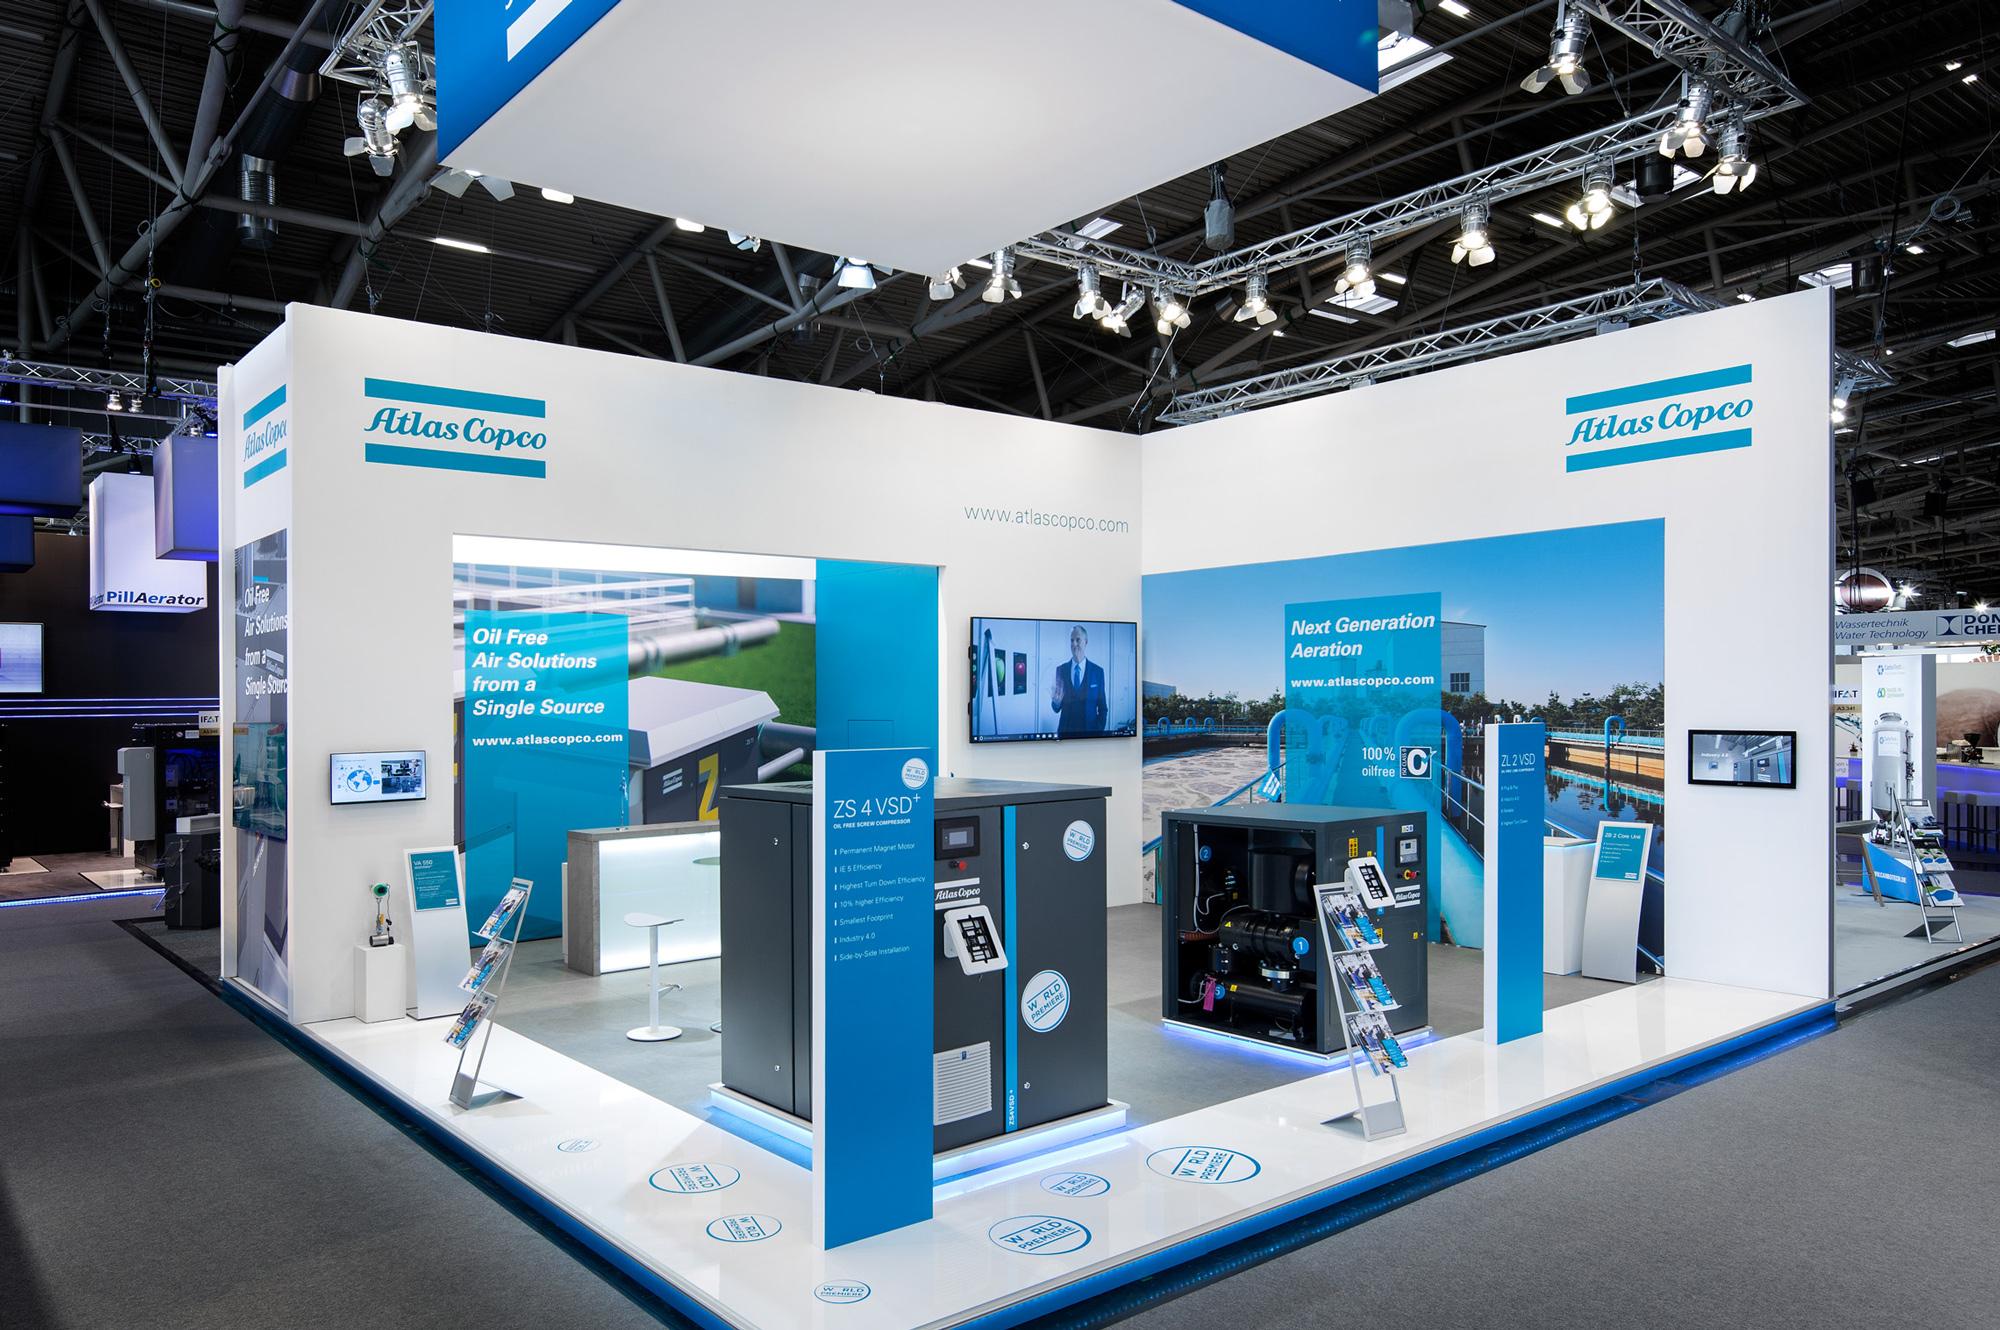 Messestand Atlas Copco IFAT 2018 München